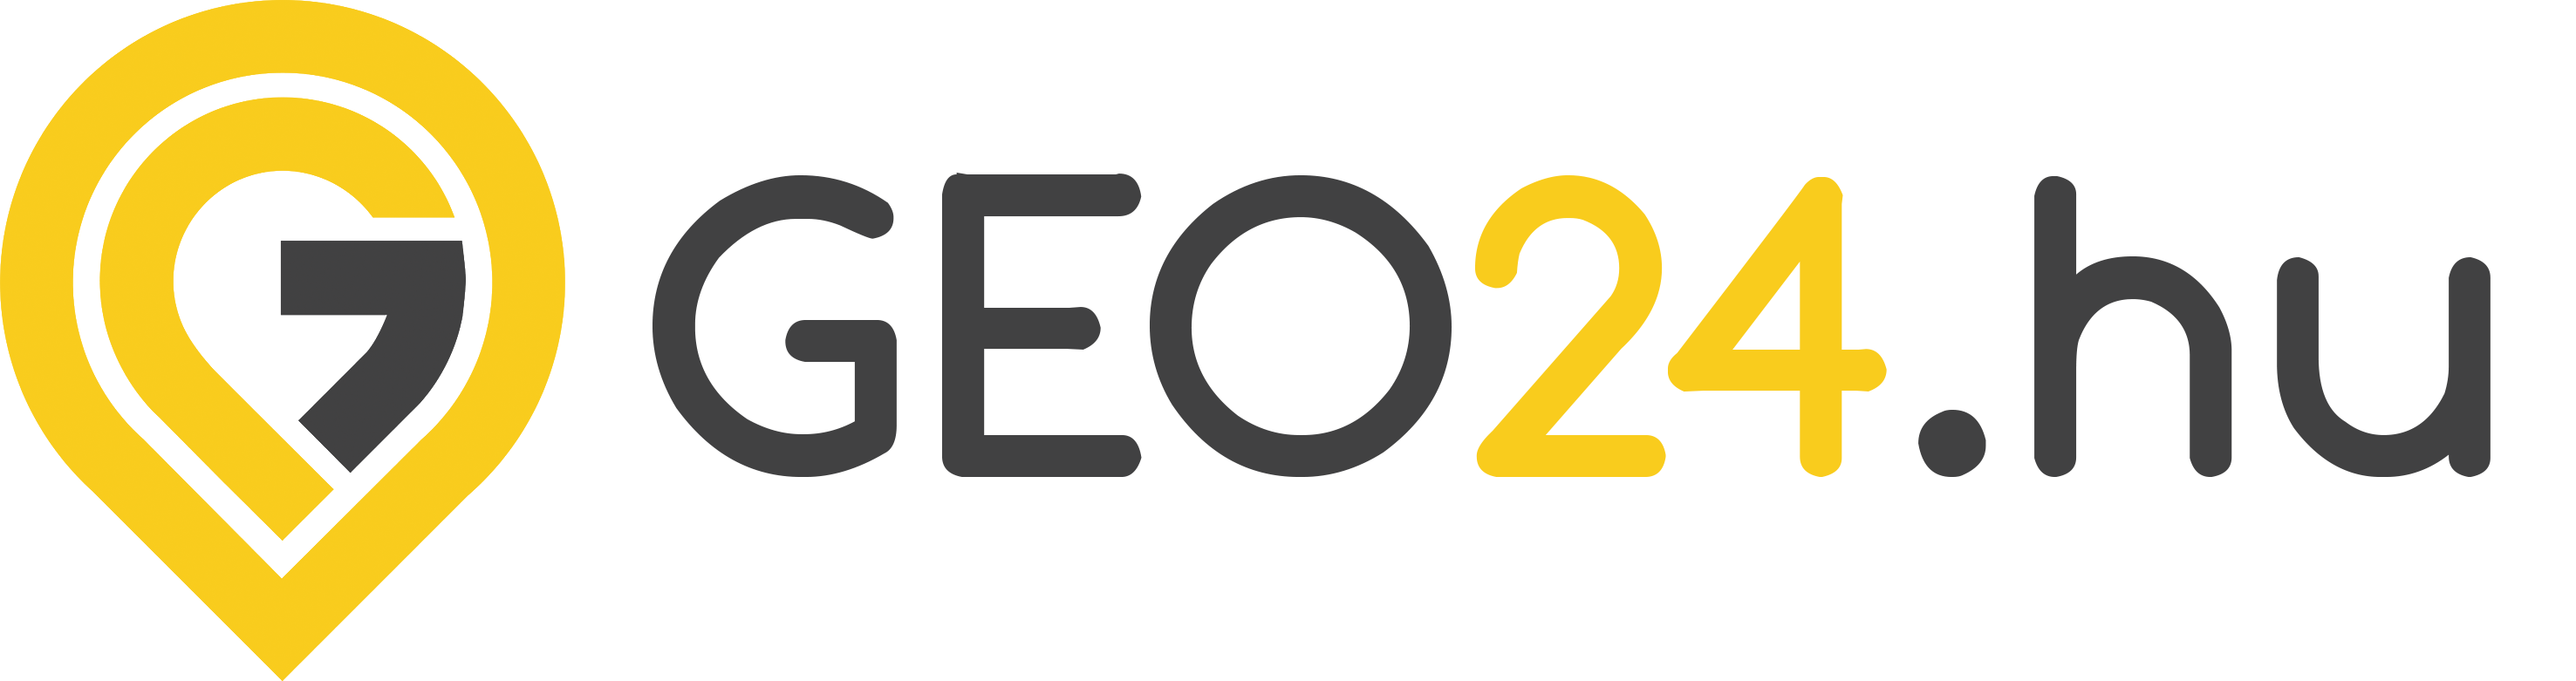 geo24_logoweb_retina2